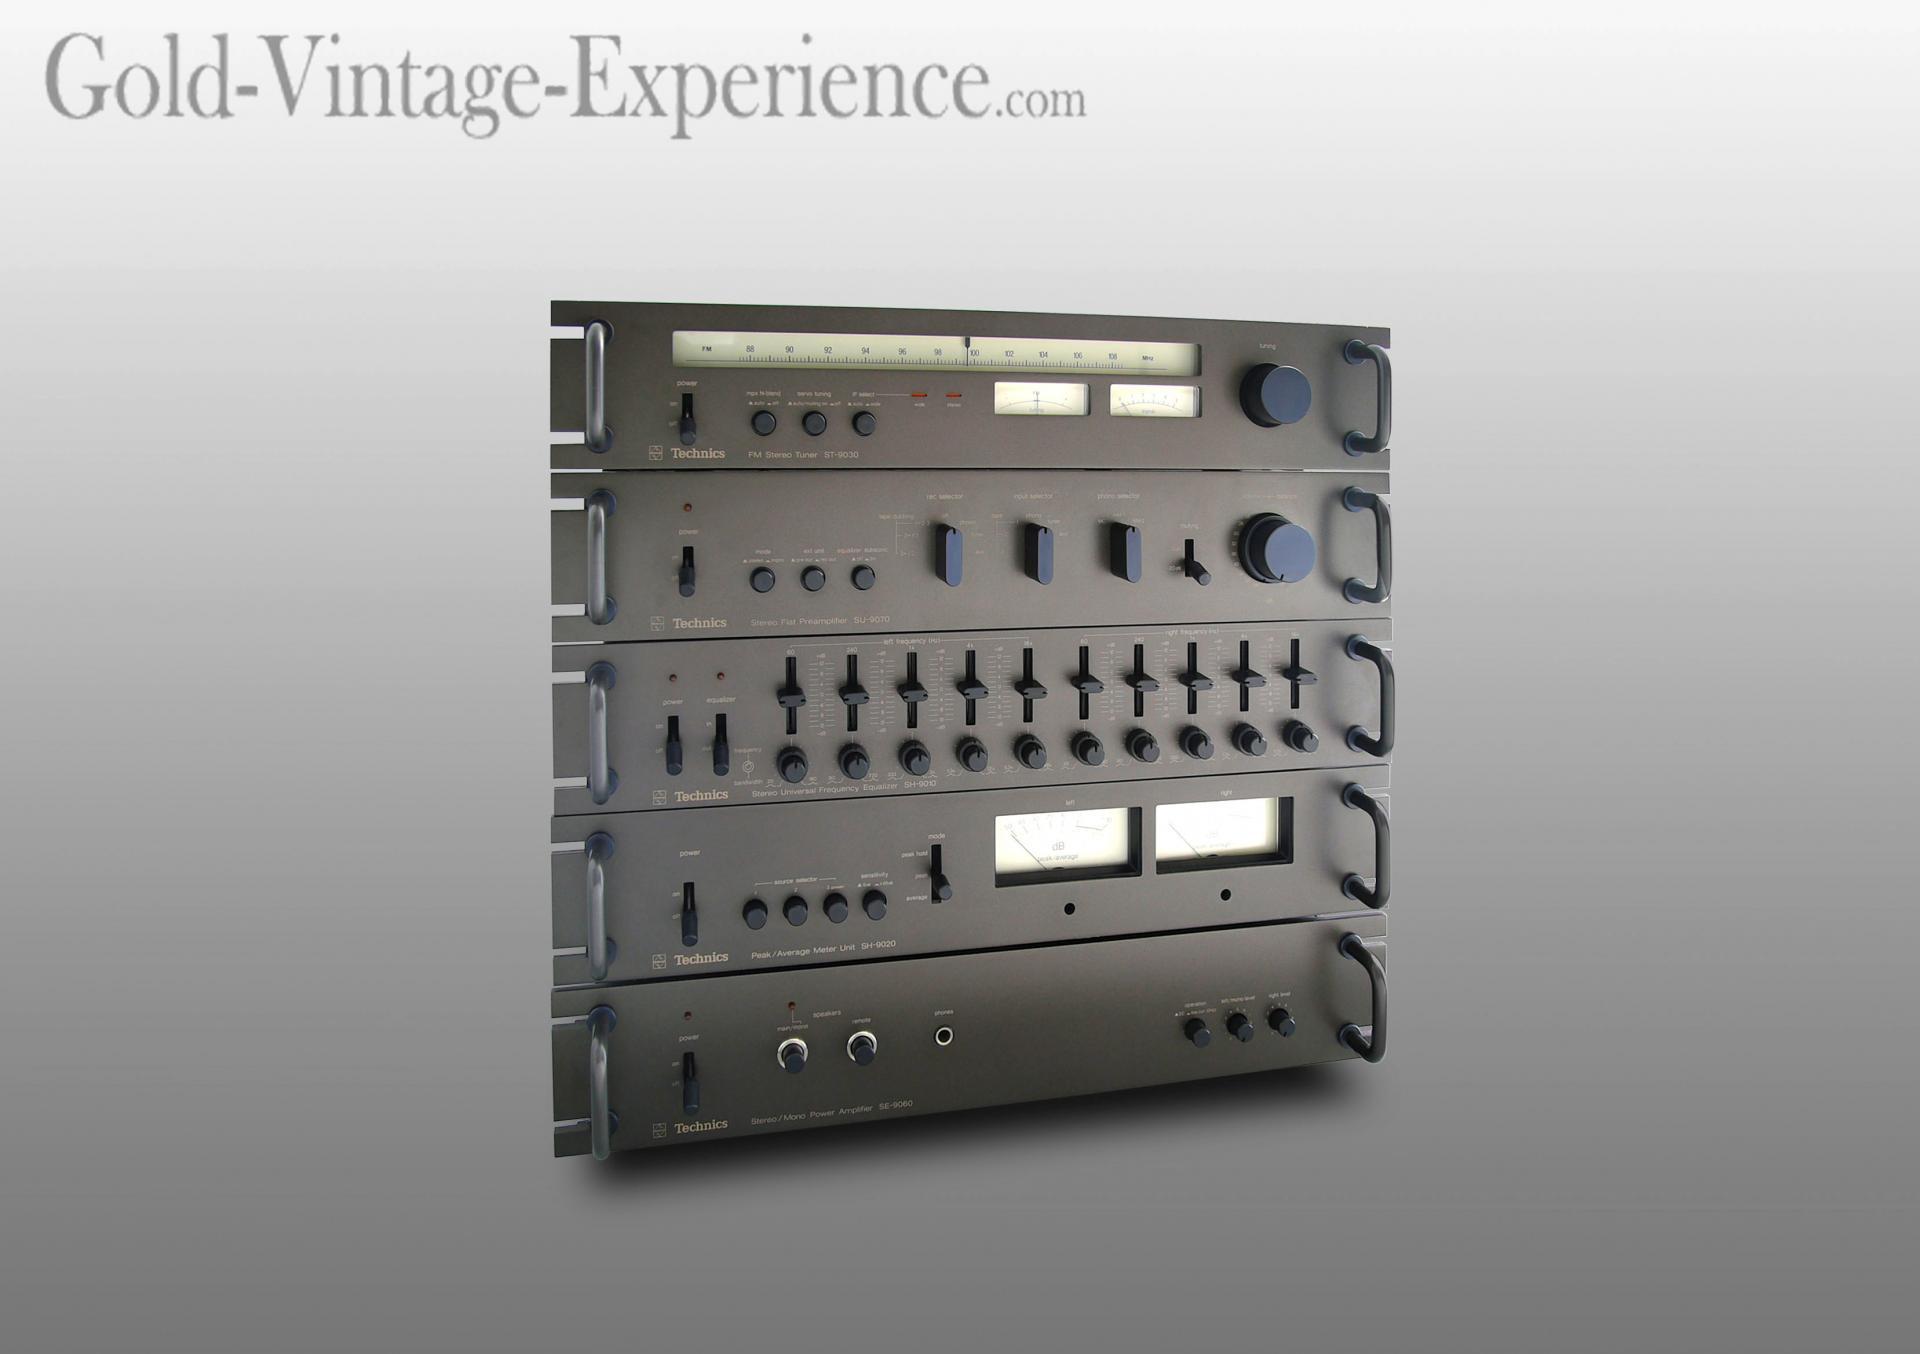 Technics serie pro